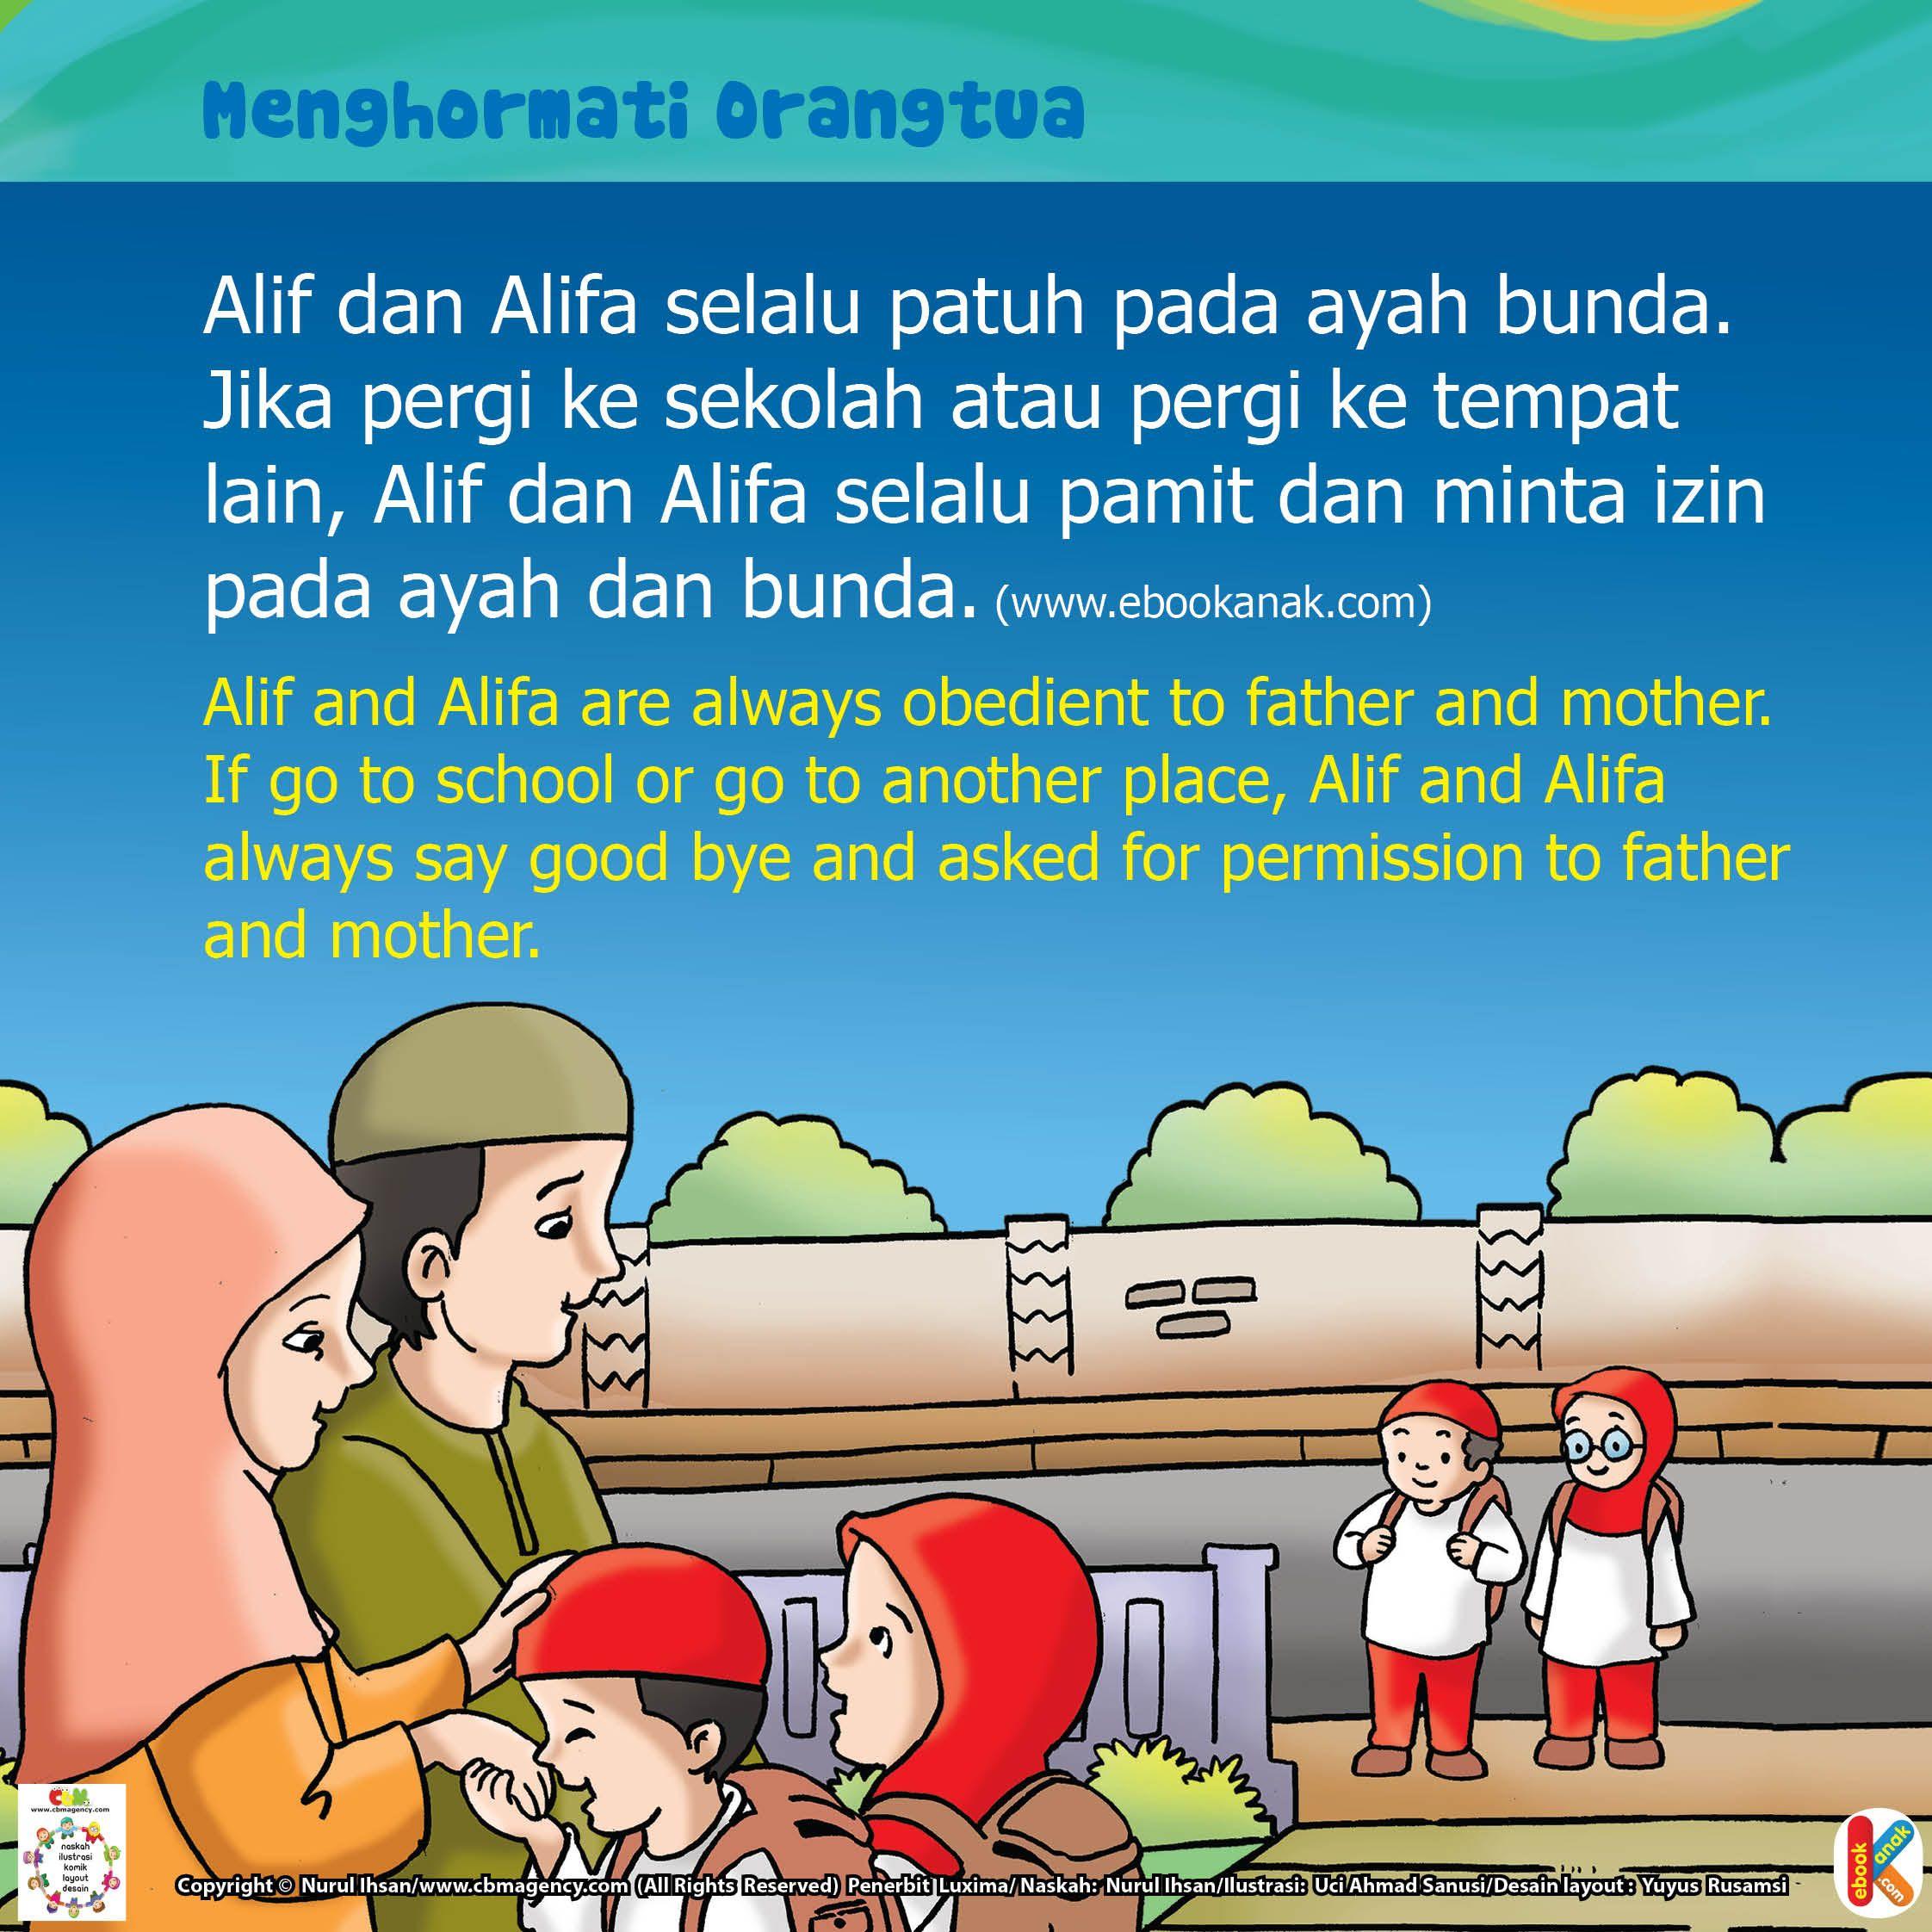 Menghormati Orangtua Ebook Anak Bepergian Literasi Membaca Buku